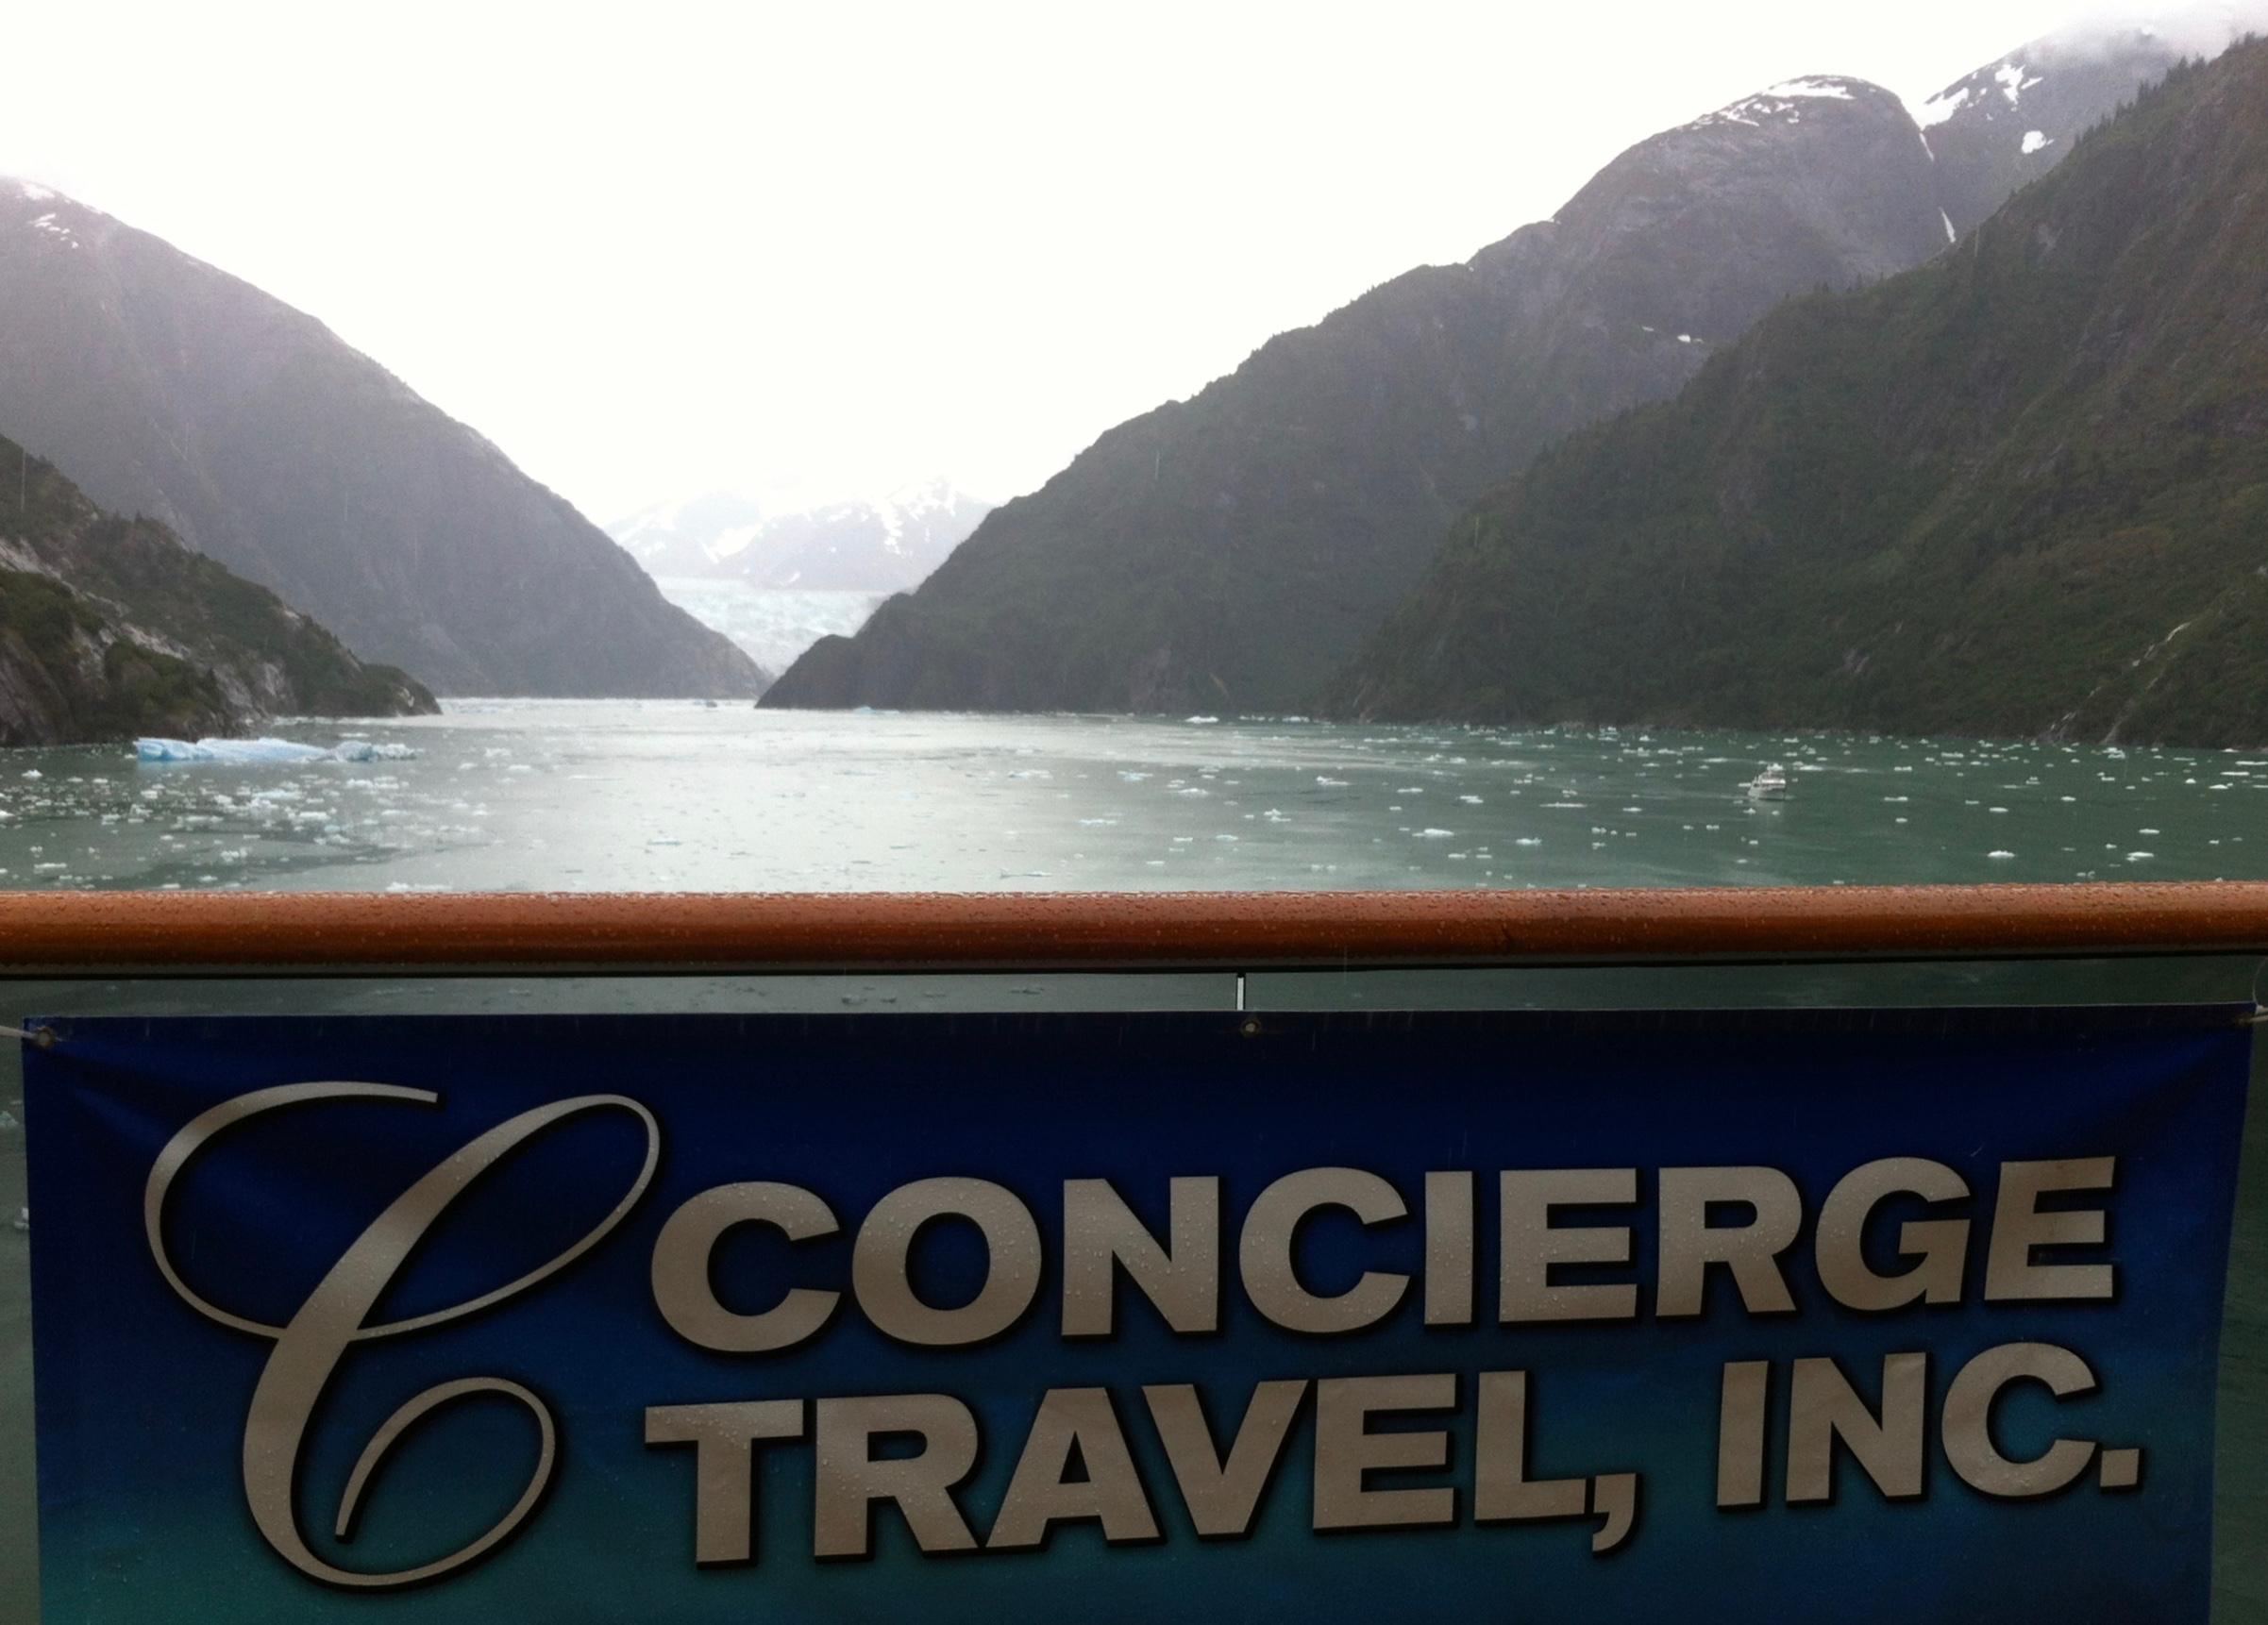 Concierge Travel - Alaska